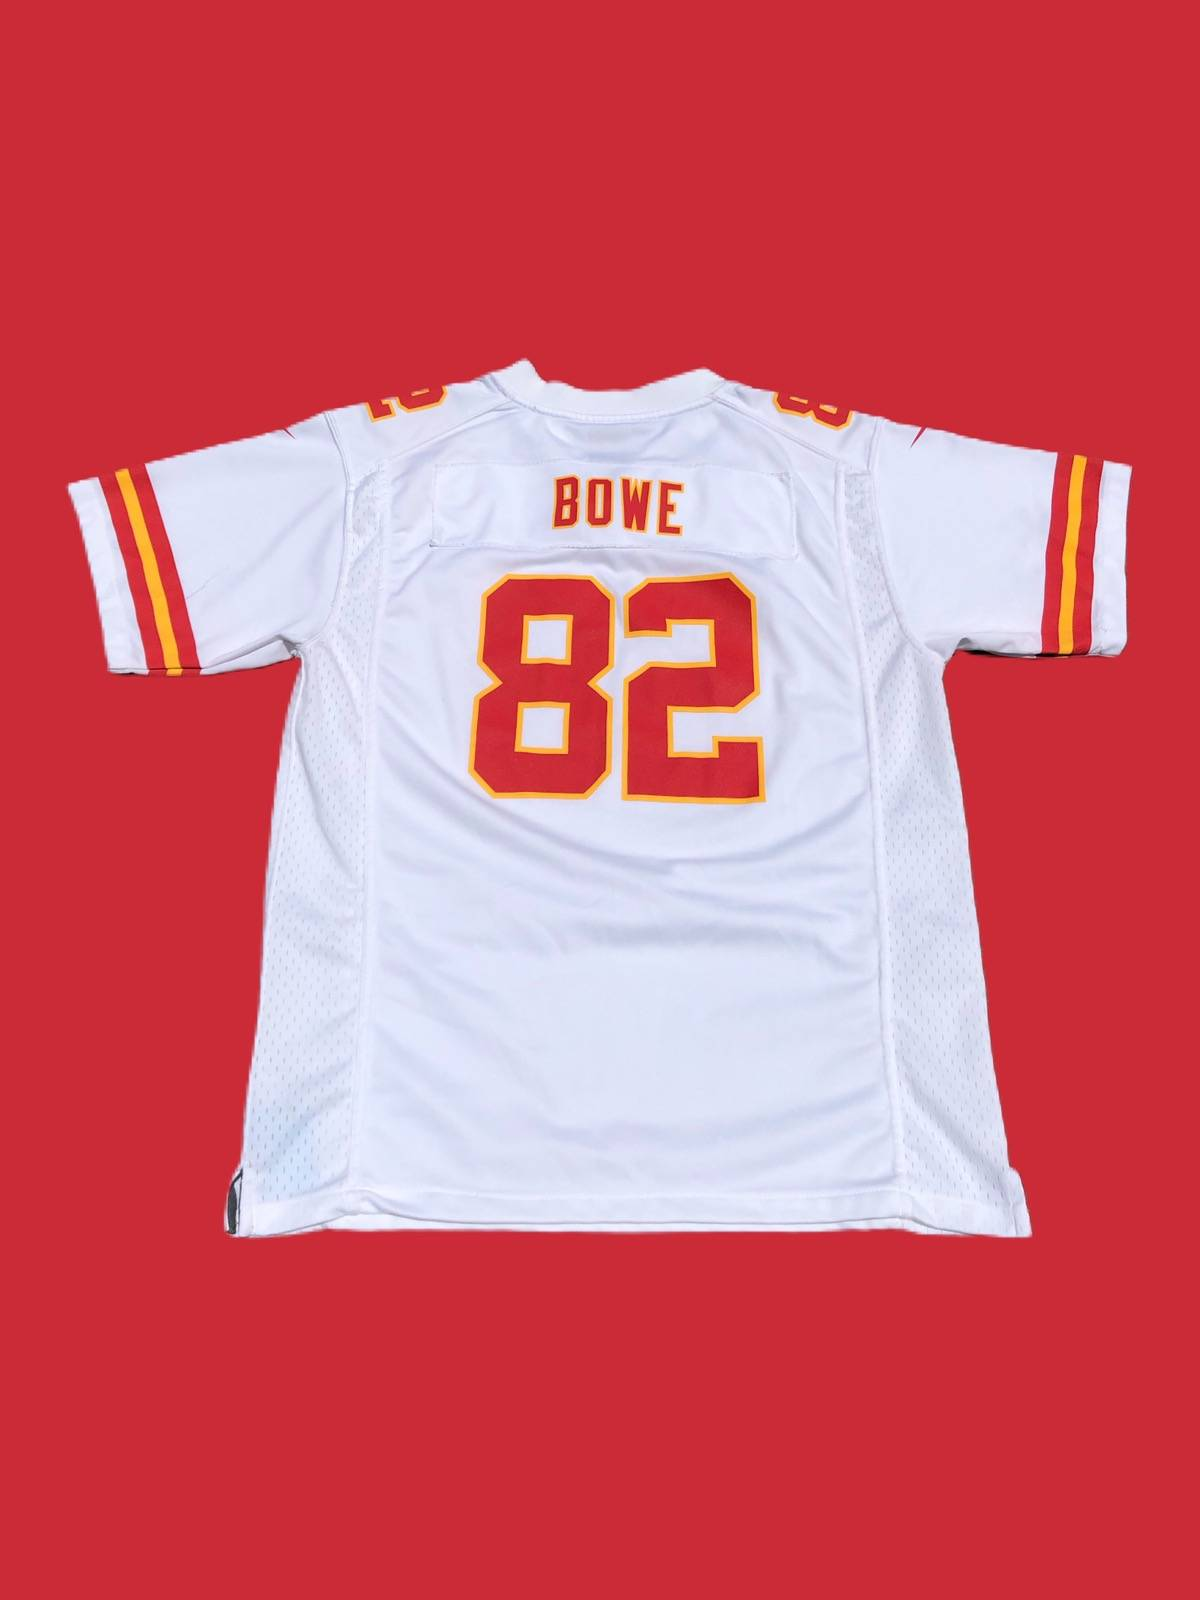 Nike Nike Kansas City Chiefs Dwayne Bowe Jersey